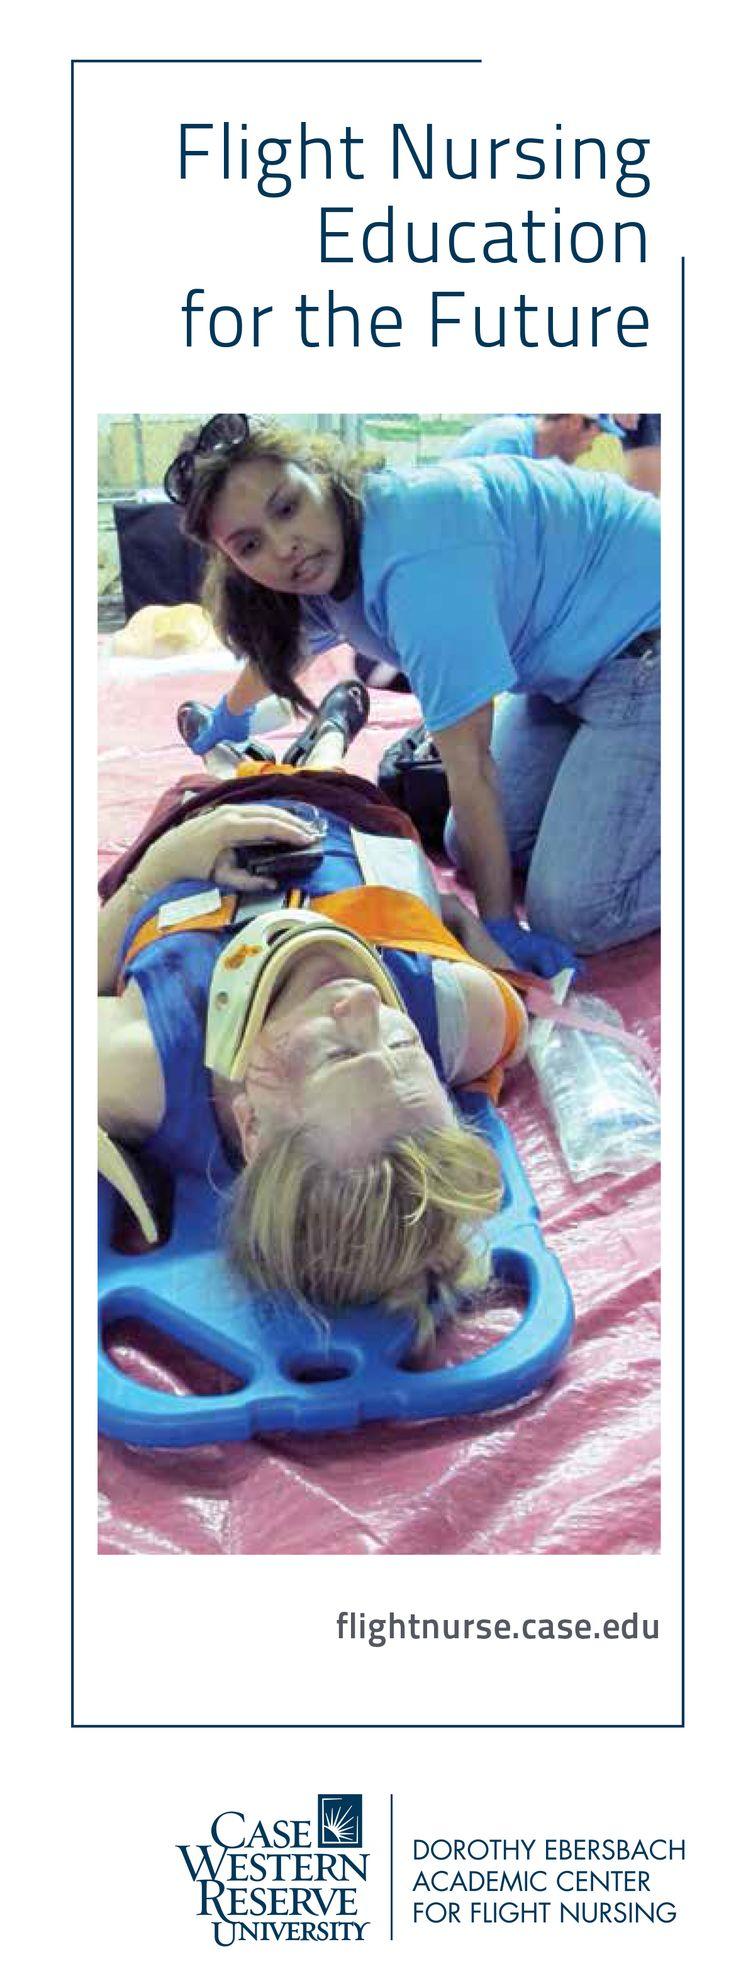 Flight Nursing Program: Frances Payne Bolton School of Nursing at Case Western Reserve University